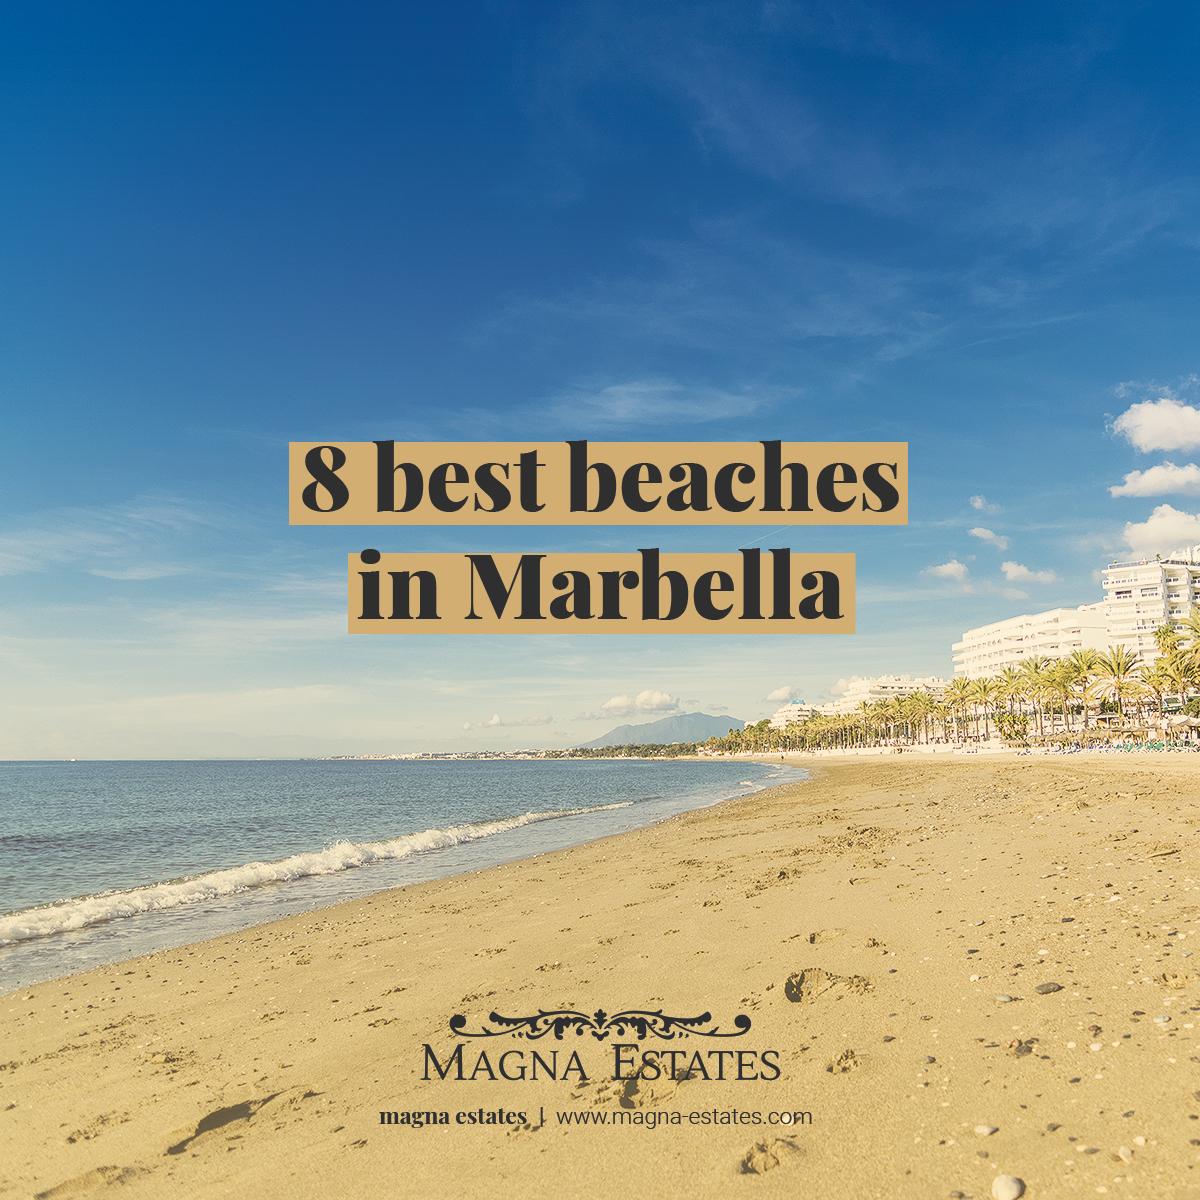 8 best beaches marbella